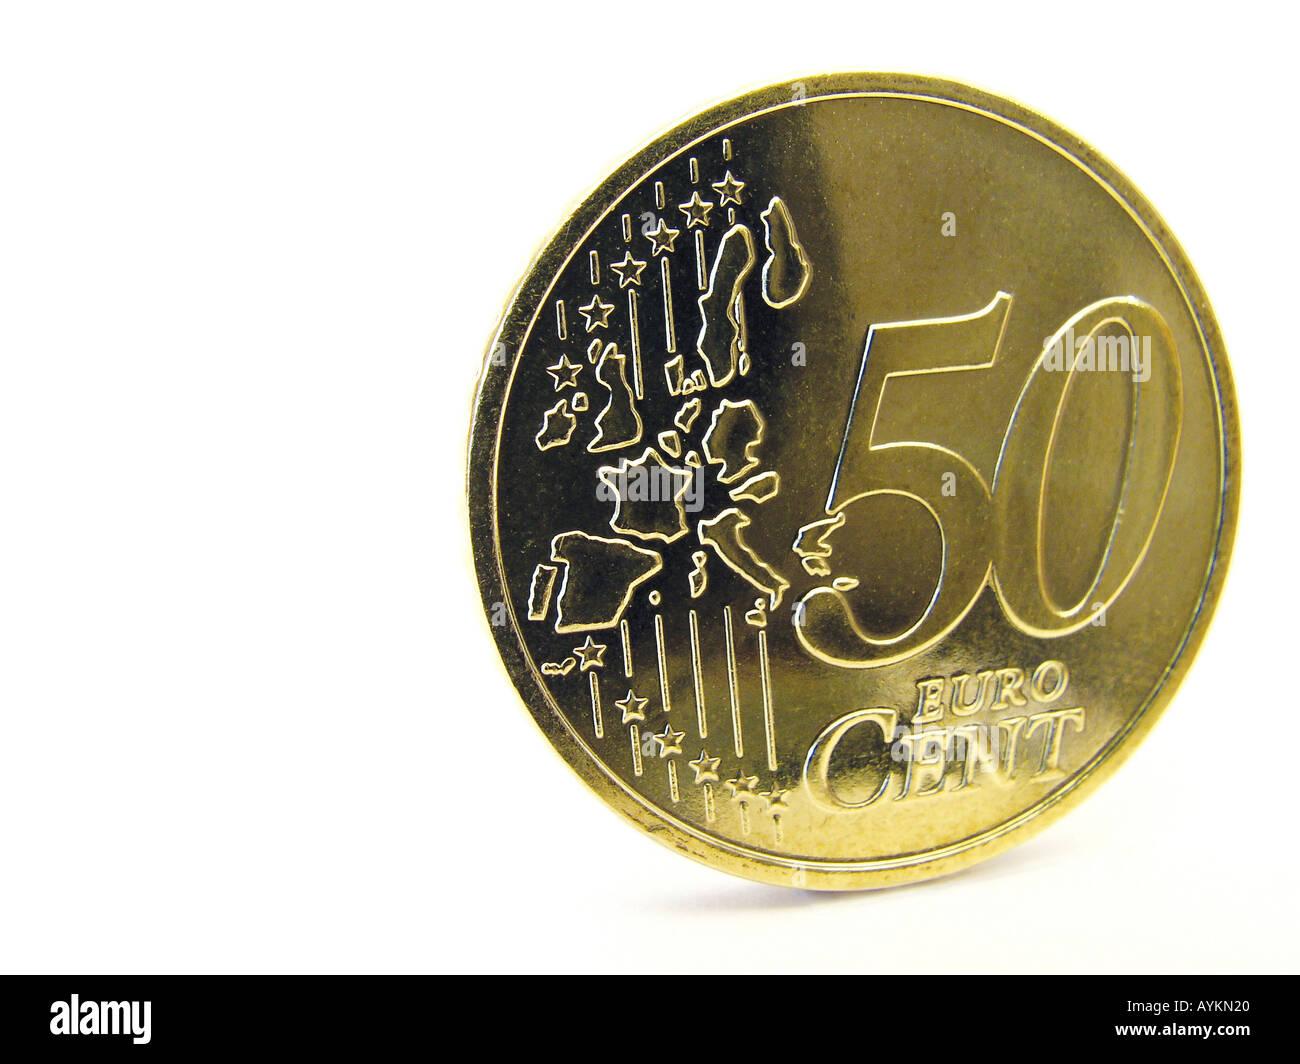 Fuenfzig Euro Cent - Stock Image